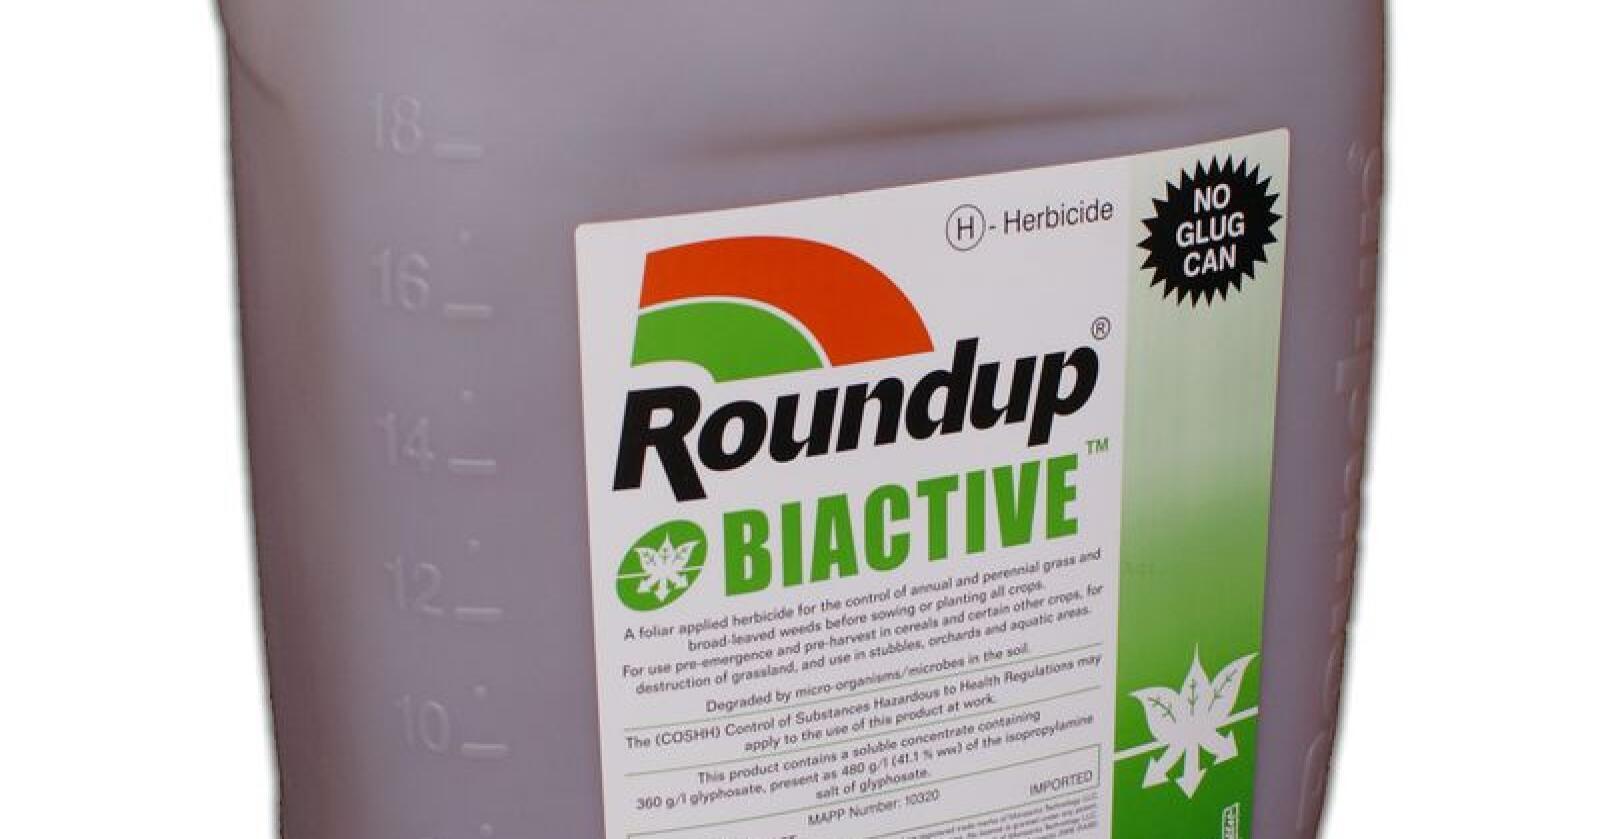 Dom: Det er ingen rimelig tvil om at glyfosat, den aktive substansen i ugressmiddelet Roundup, var en medvirkende årsak til kreften, kom juryen i San Francisco til.